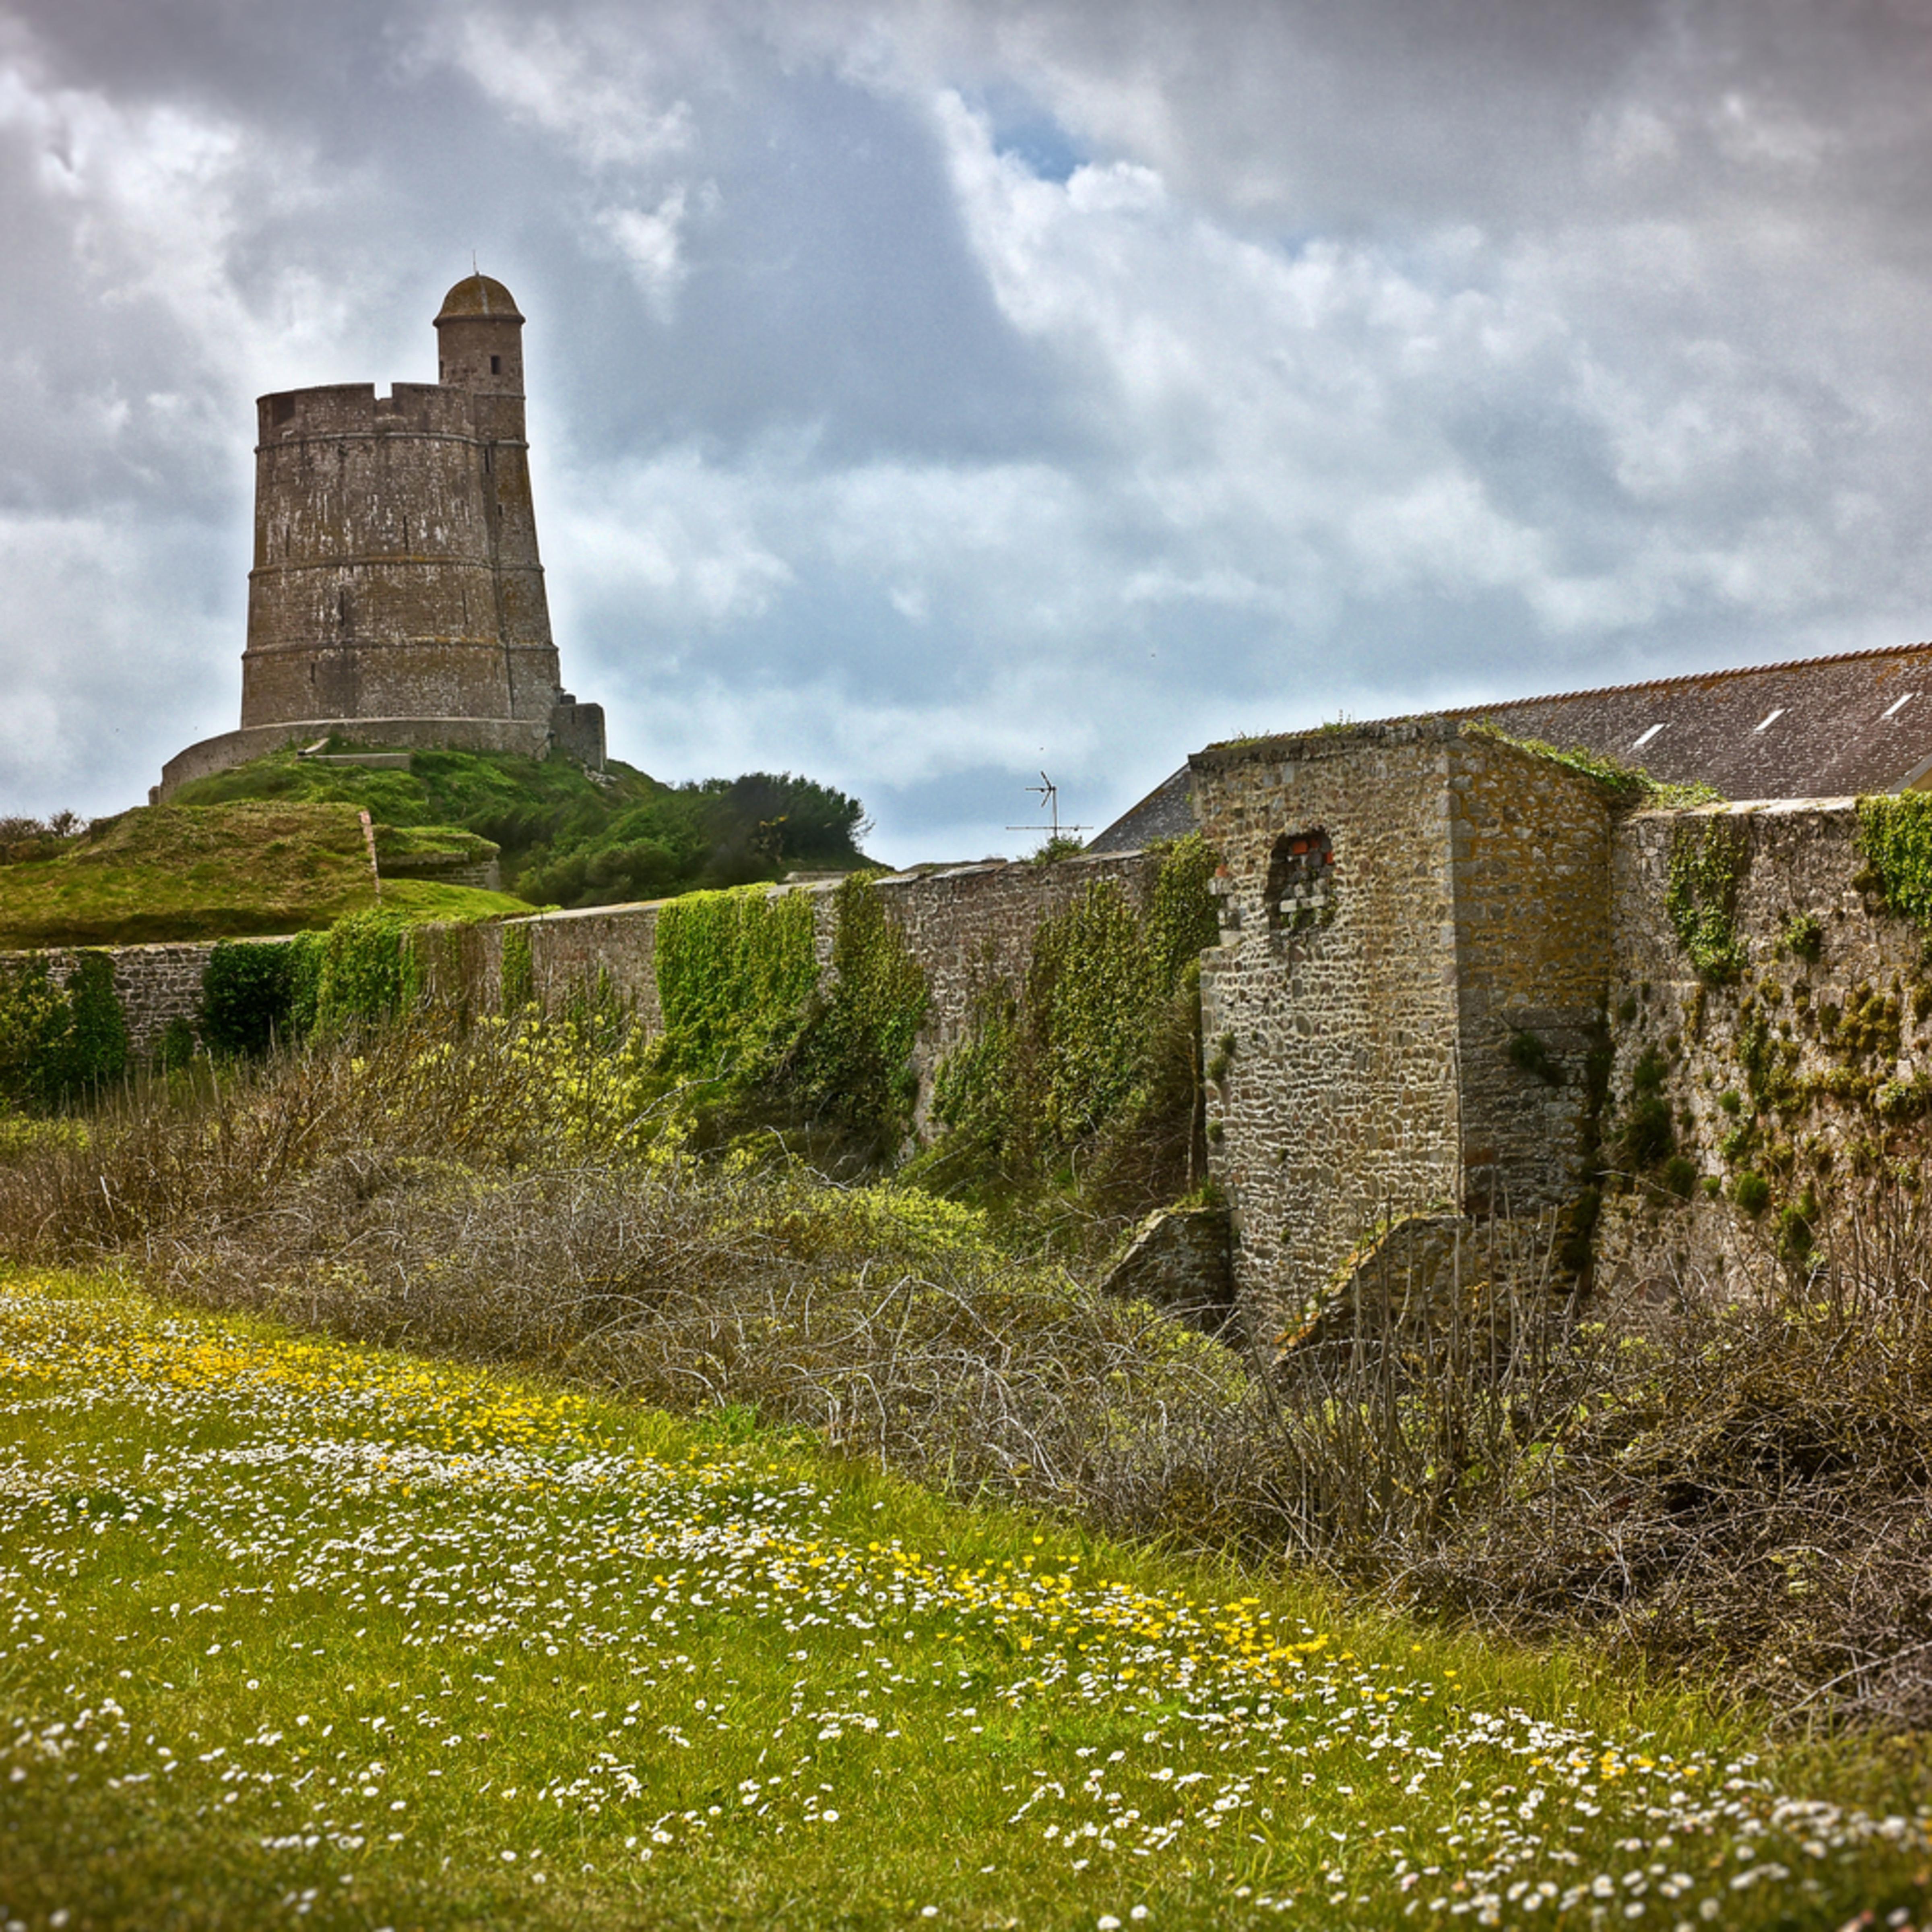 Fort de la hogue jwyrgy